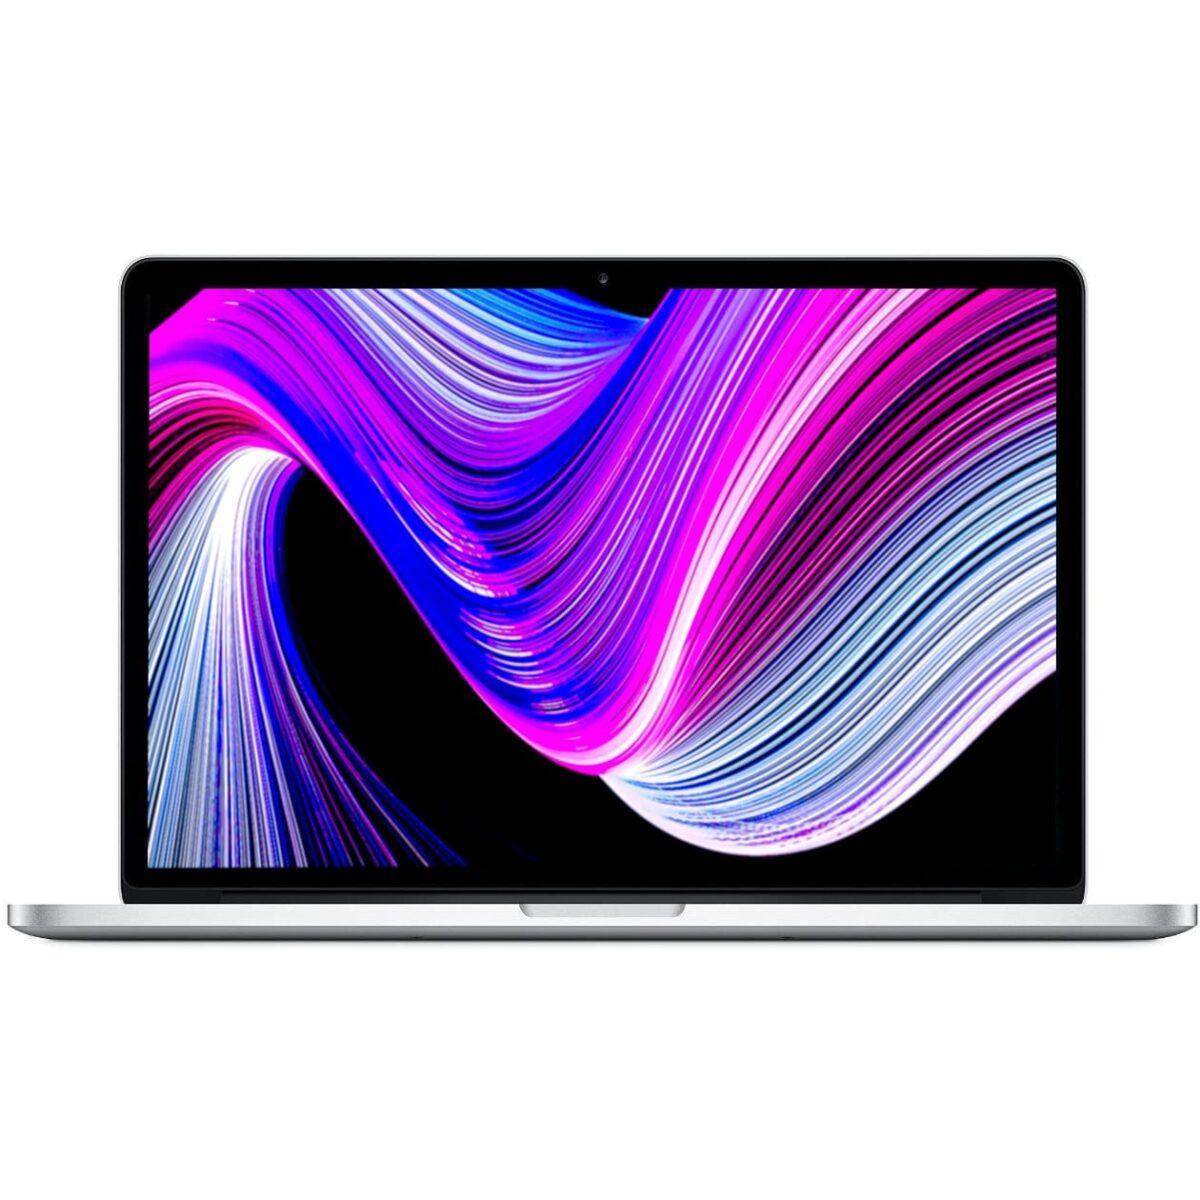 "Retina Apple Macbook Pro 13.3"" 512GB SSD 16GB RAM Core i7 3.10GHZ Powerful A1502 Mac Laptop OS Big Sur"